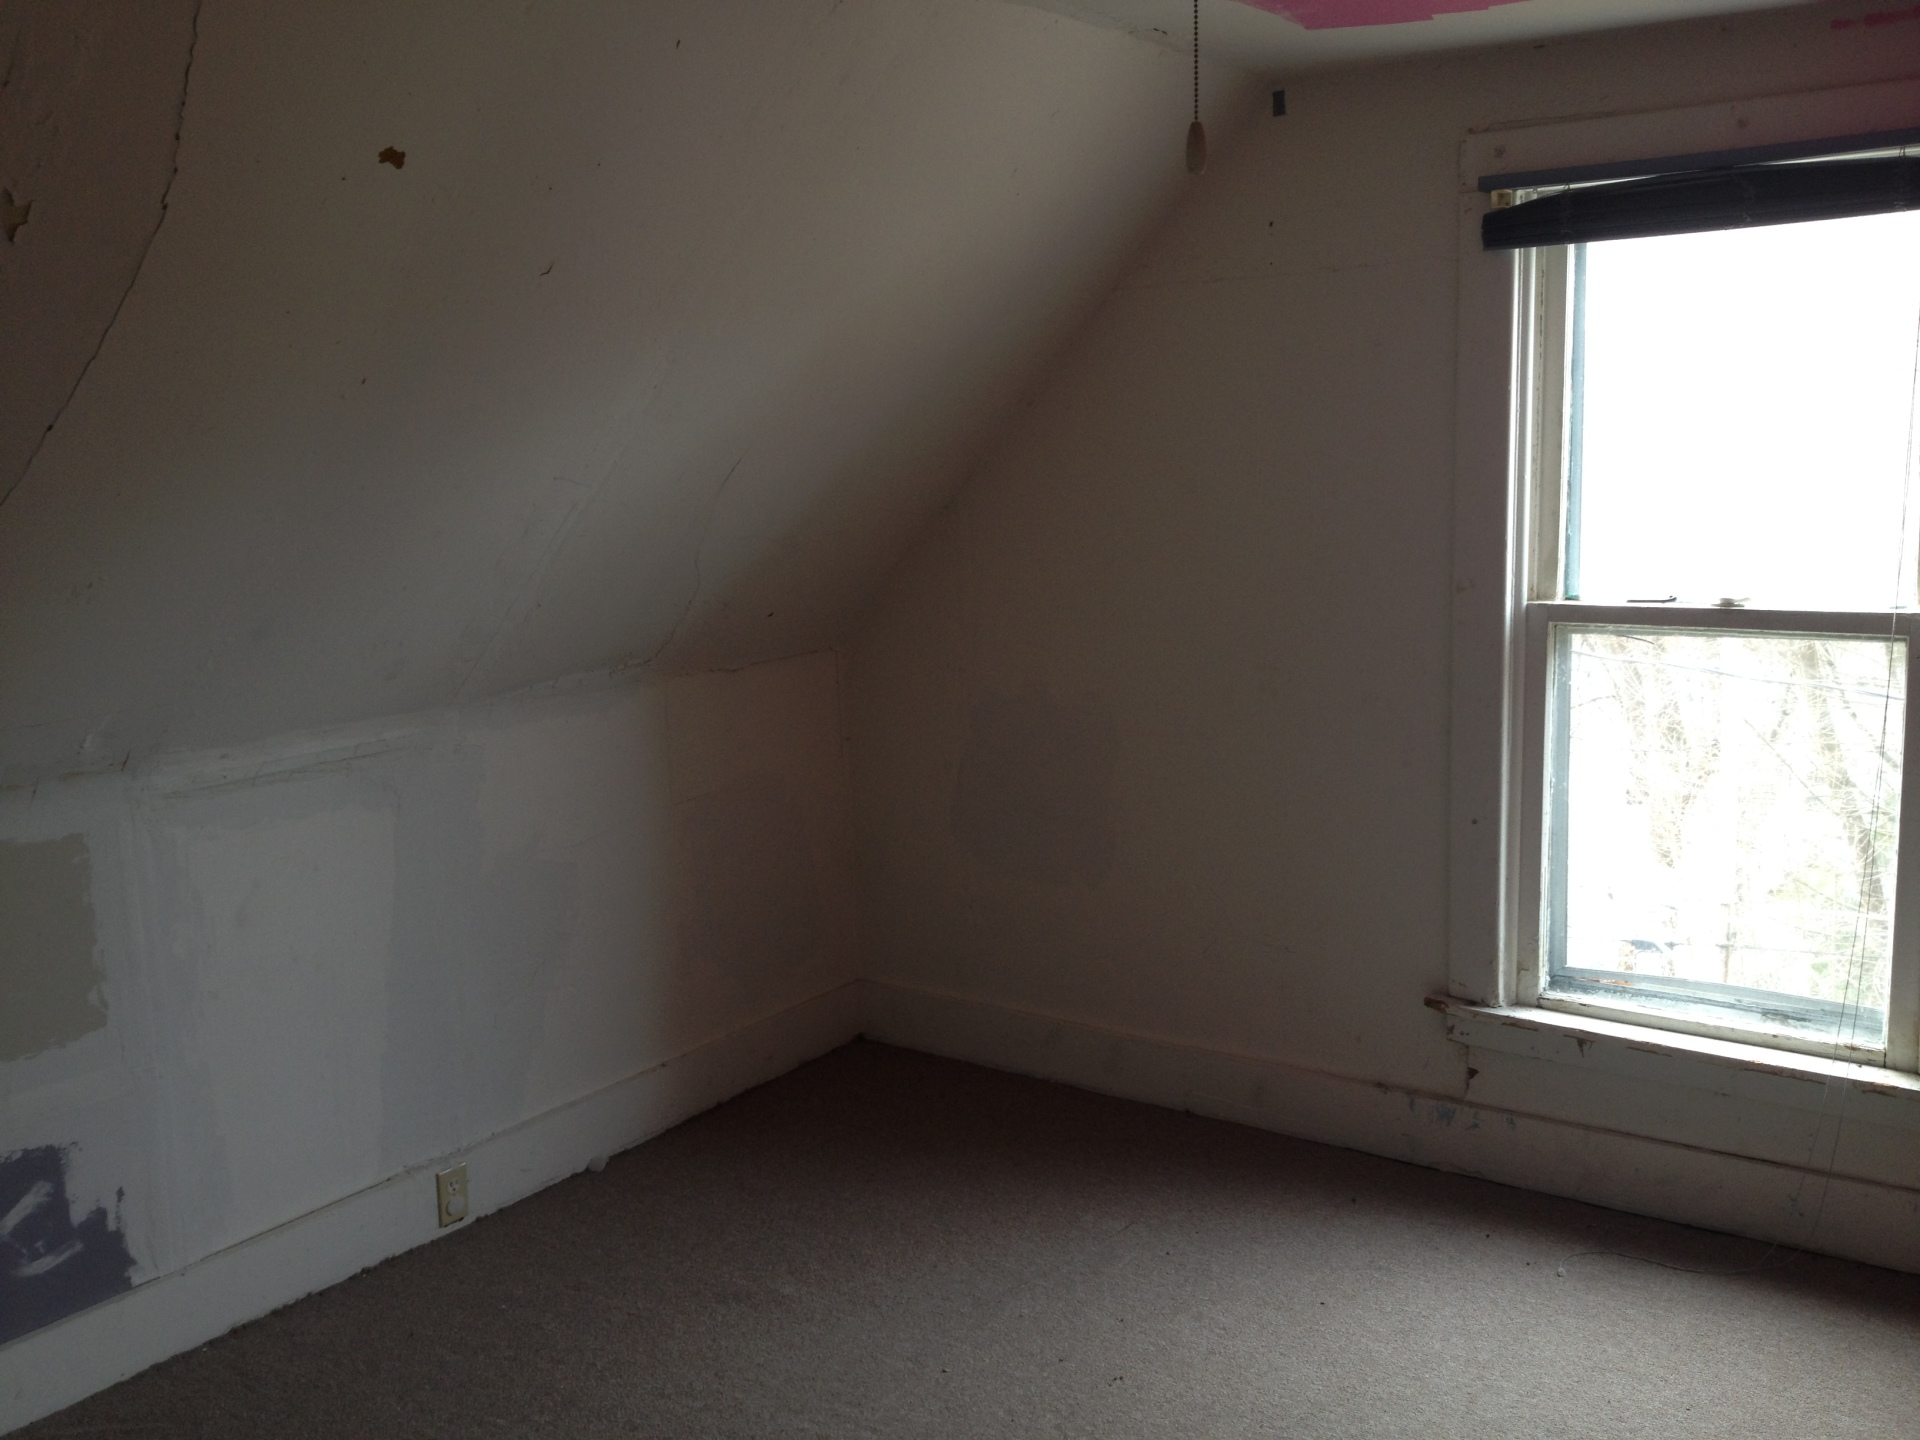 97B room